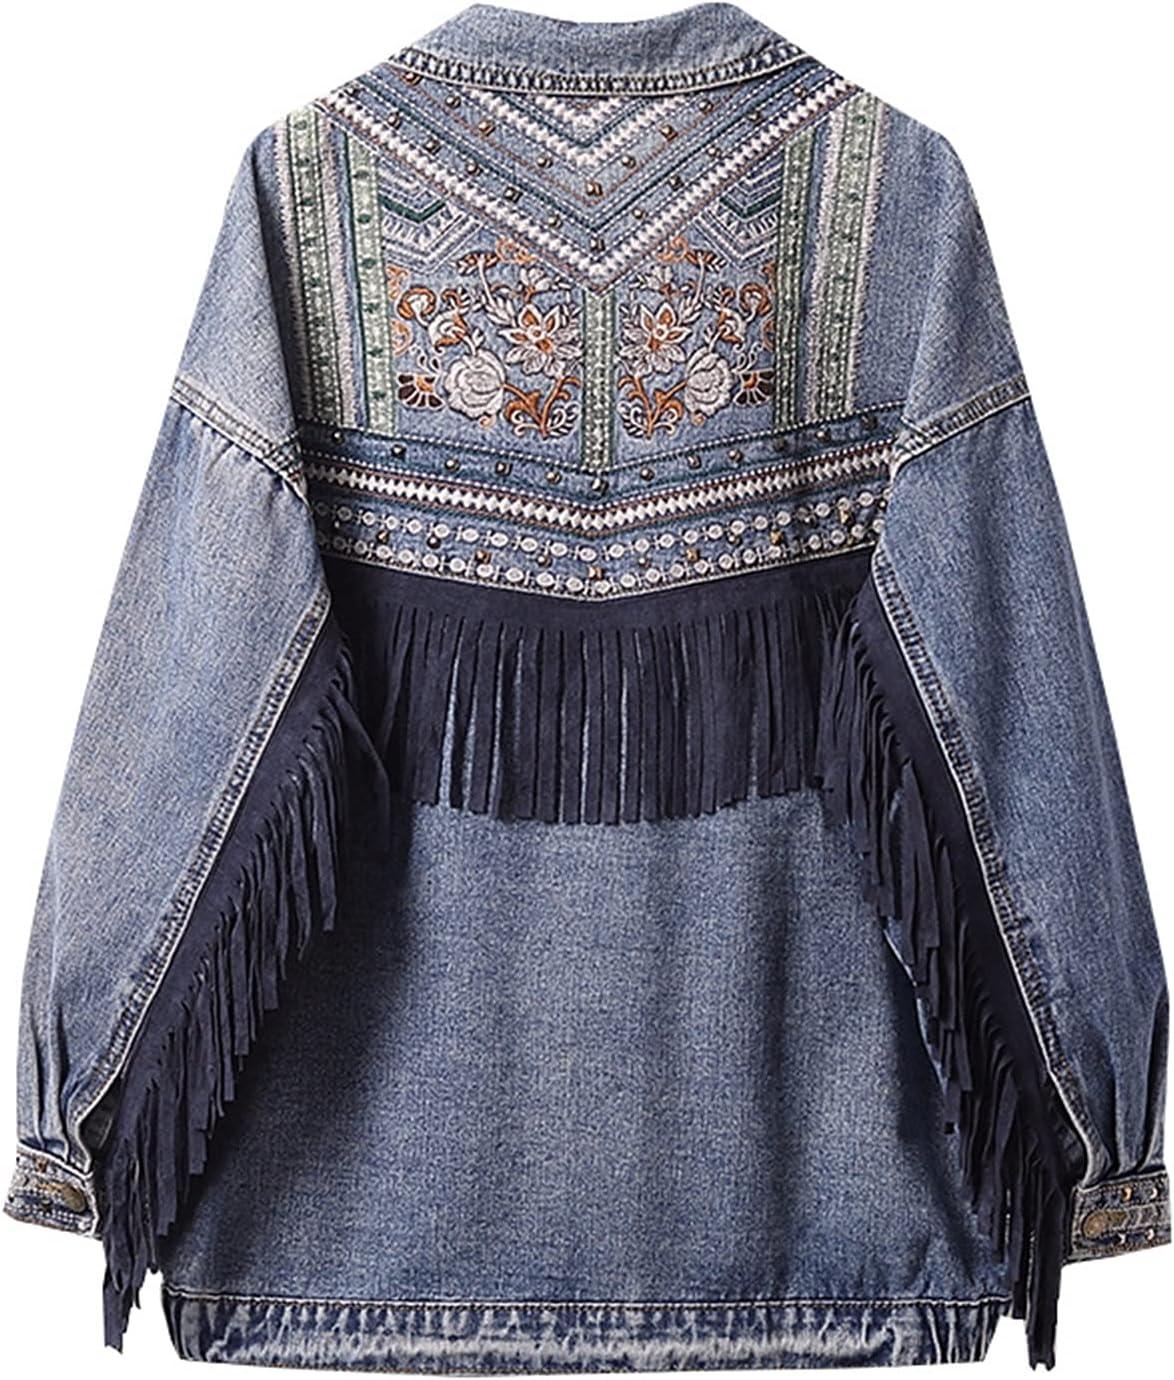 Zzalo Denim Jacket Korean Floral Embroidery Suede Fringe Loose Coat Long Sleeve Outerwear Jacket Women Jacket (Color : Blue, Size : Large)